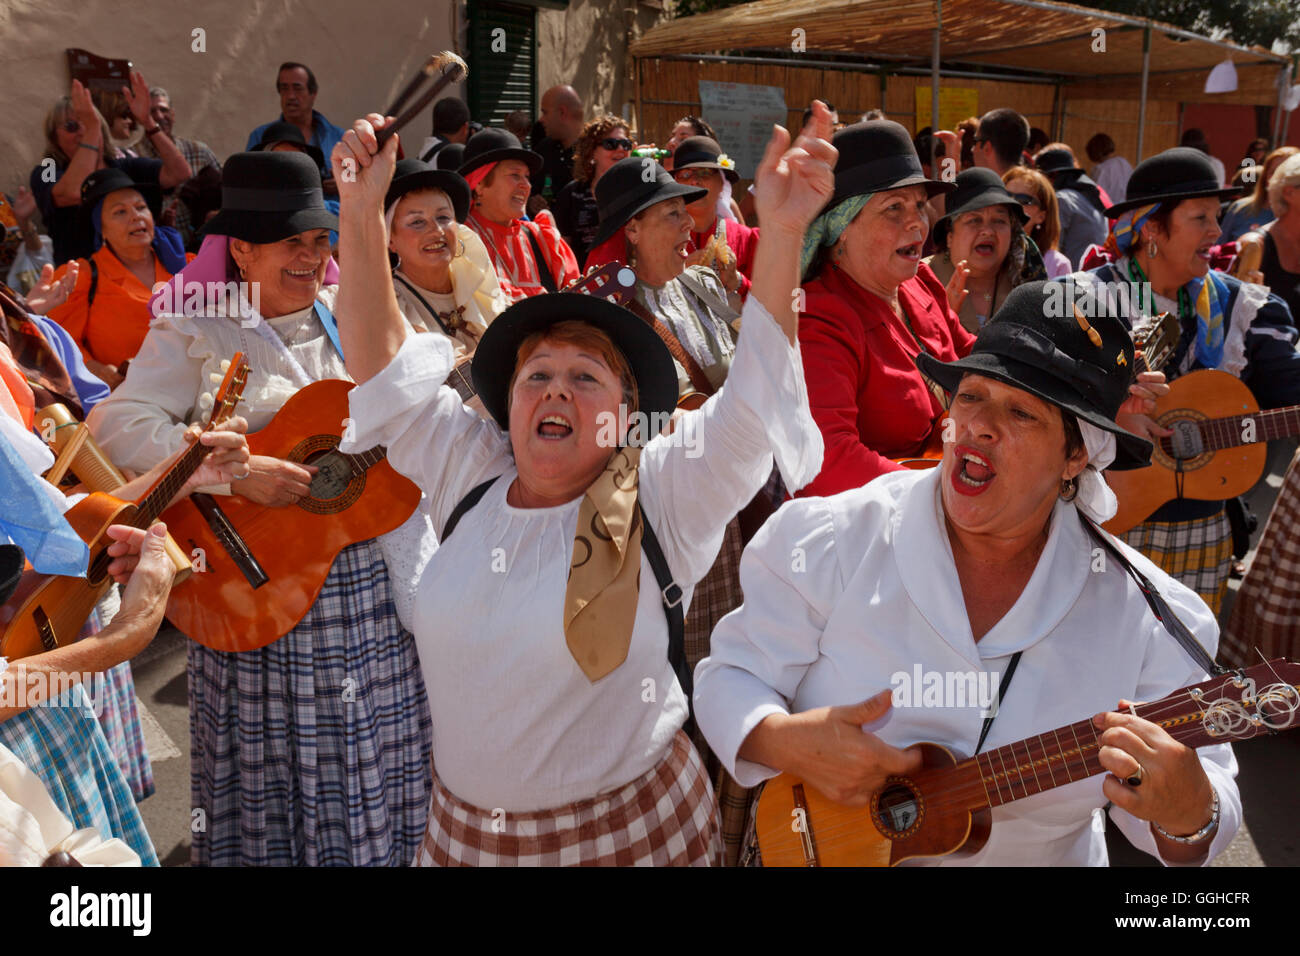 Folk music at the festival of almond blossom, Fiesta del Almendrero en Flor, Valsequillo, near Telde, Gran Canaria, - Stock Image